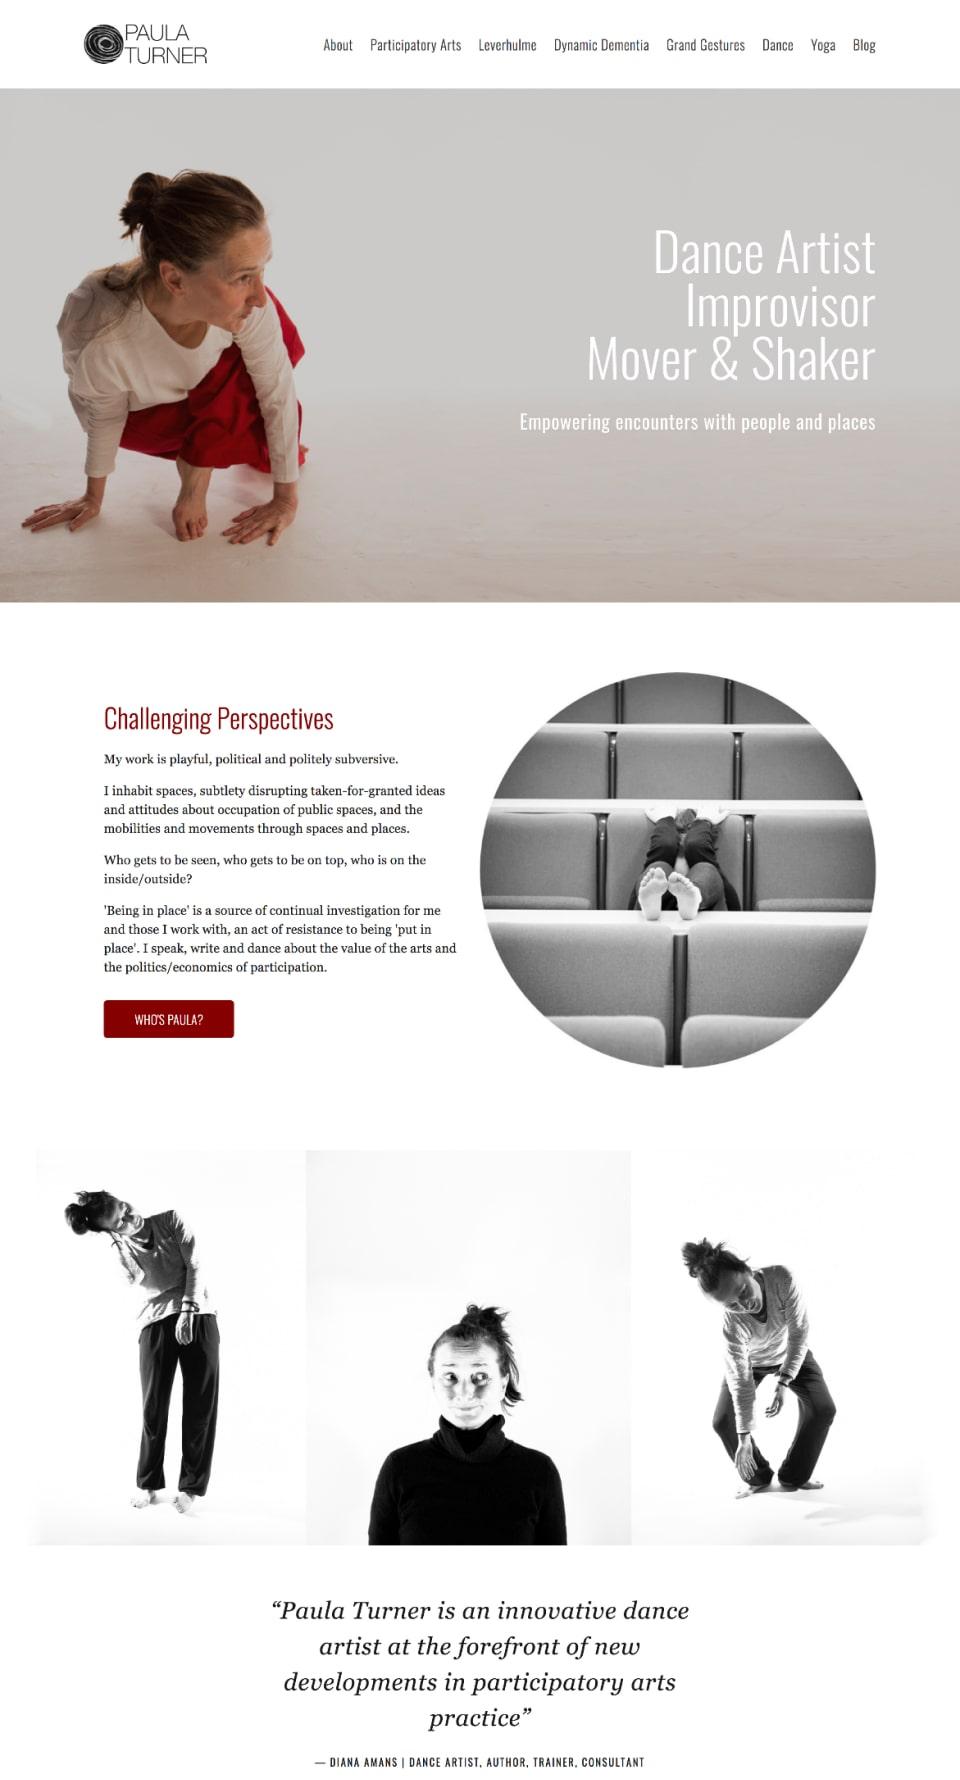 Web design portfolio mockup for Paula Turner